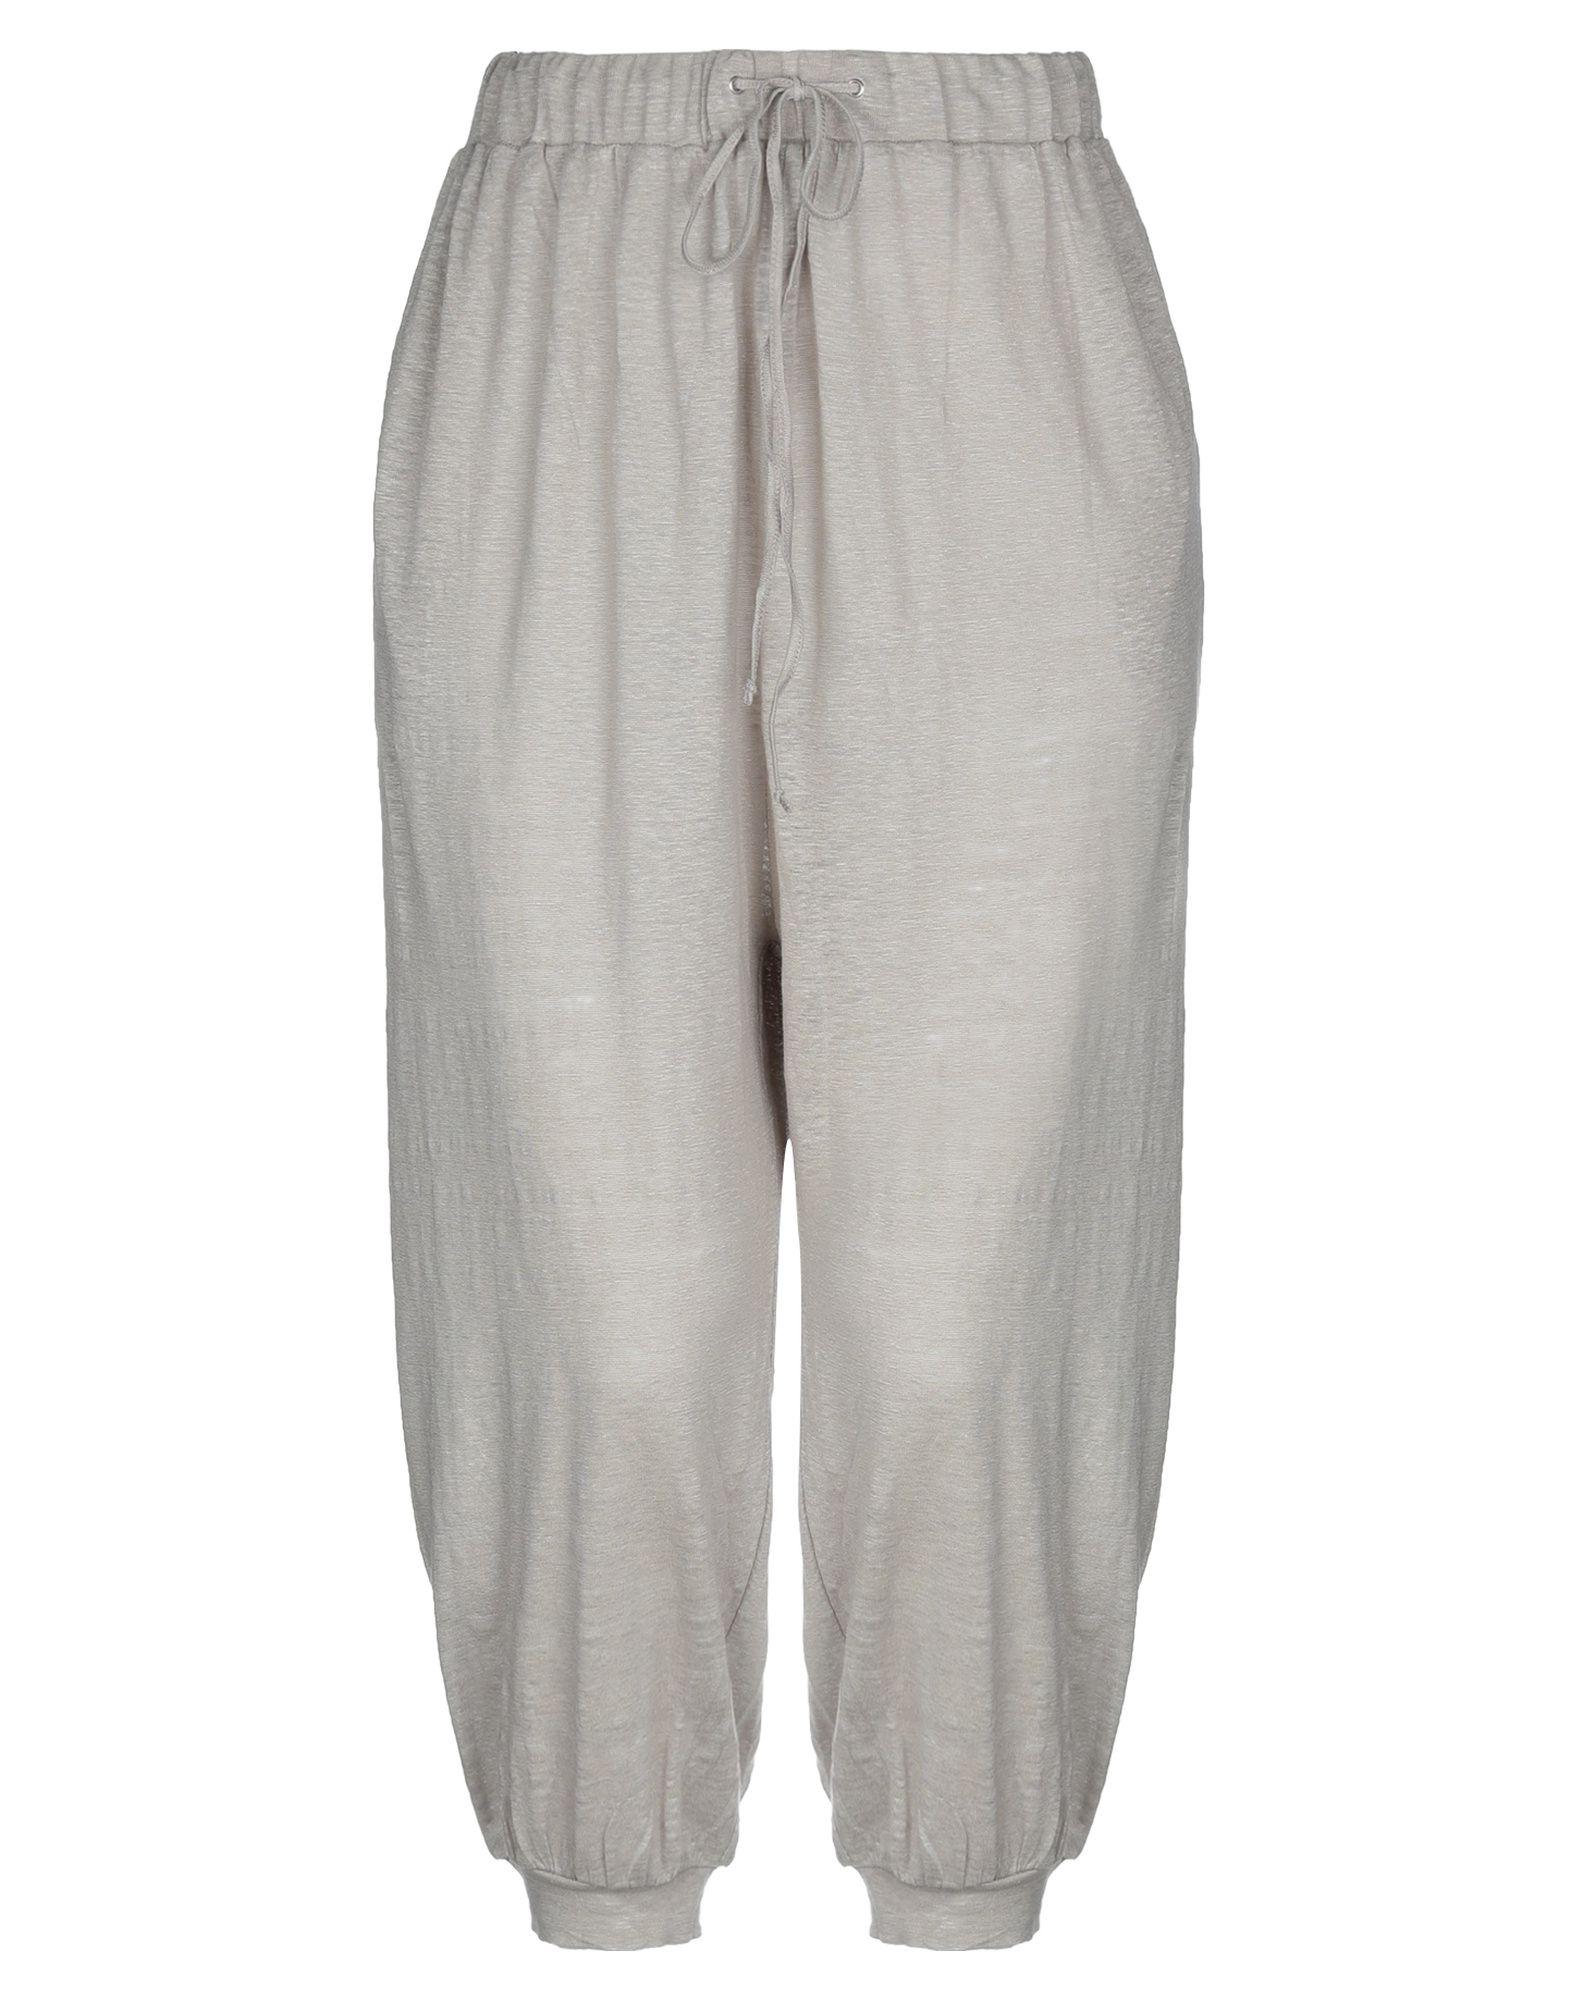 FINE COLLECTION Брюки-капри fine collection повседневные брюки